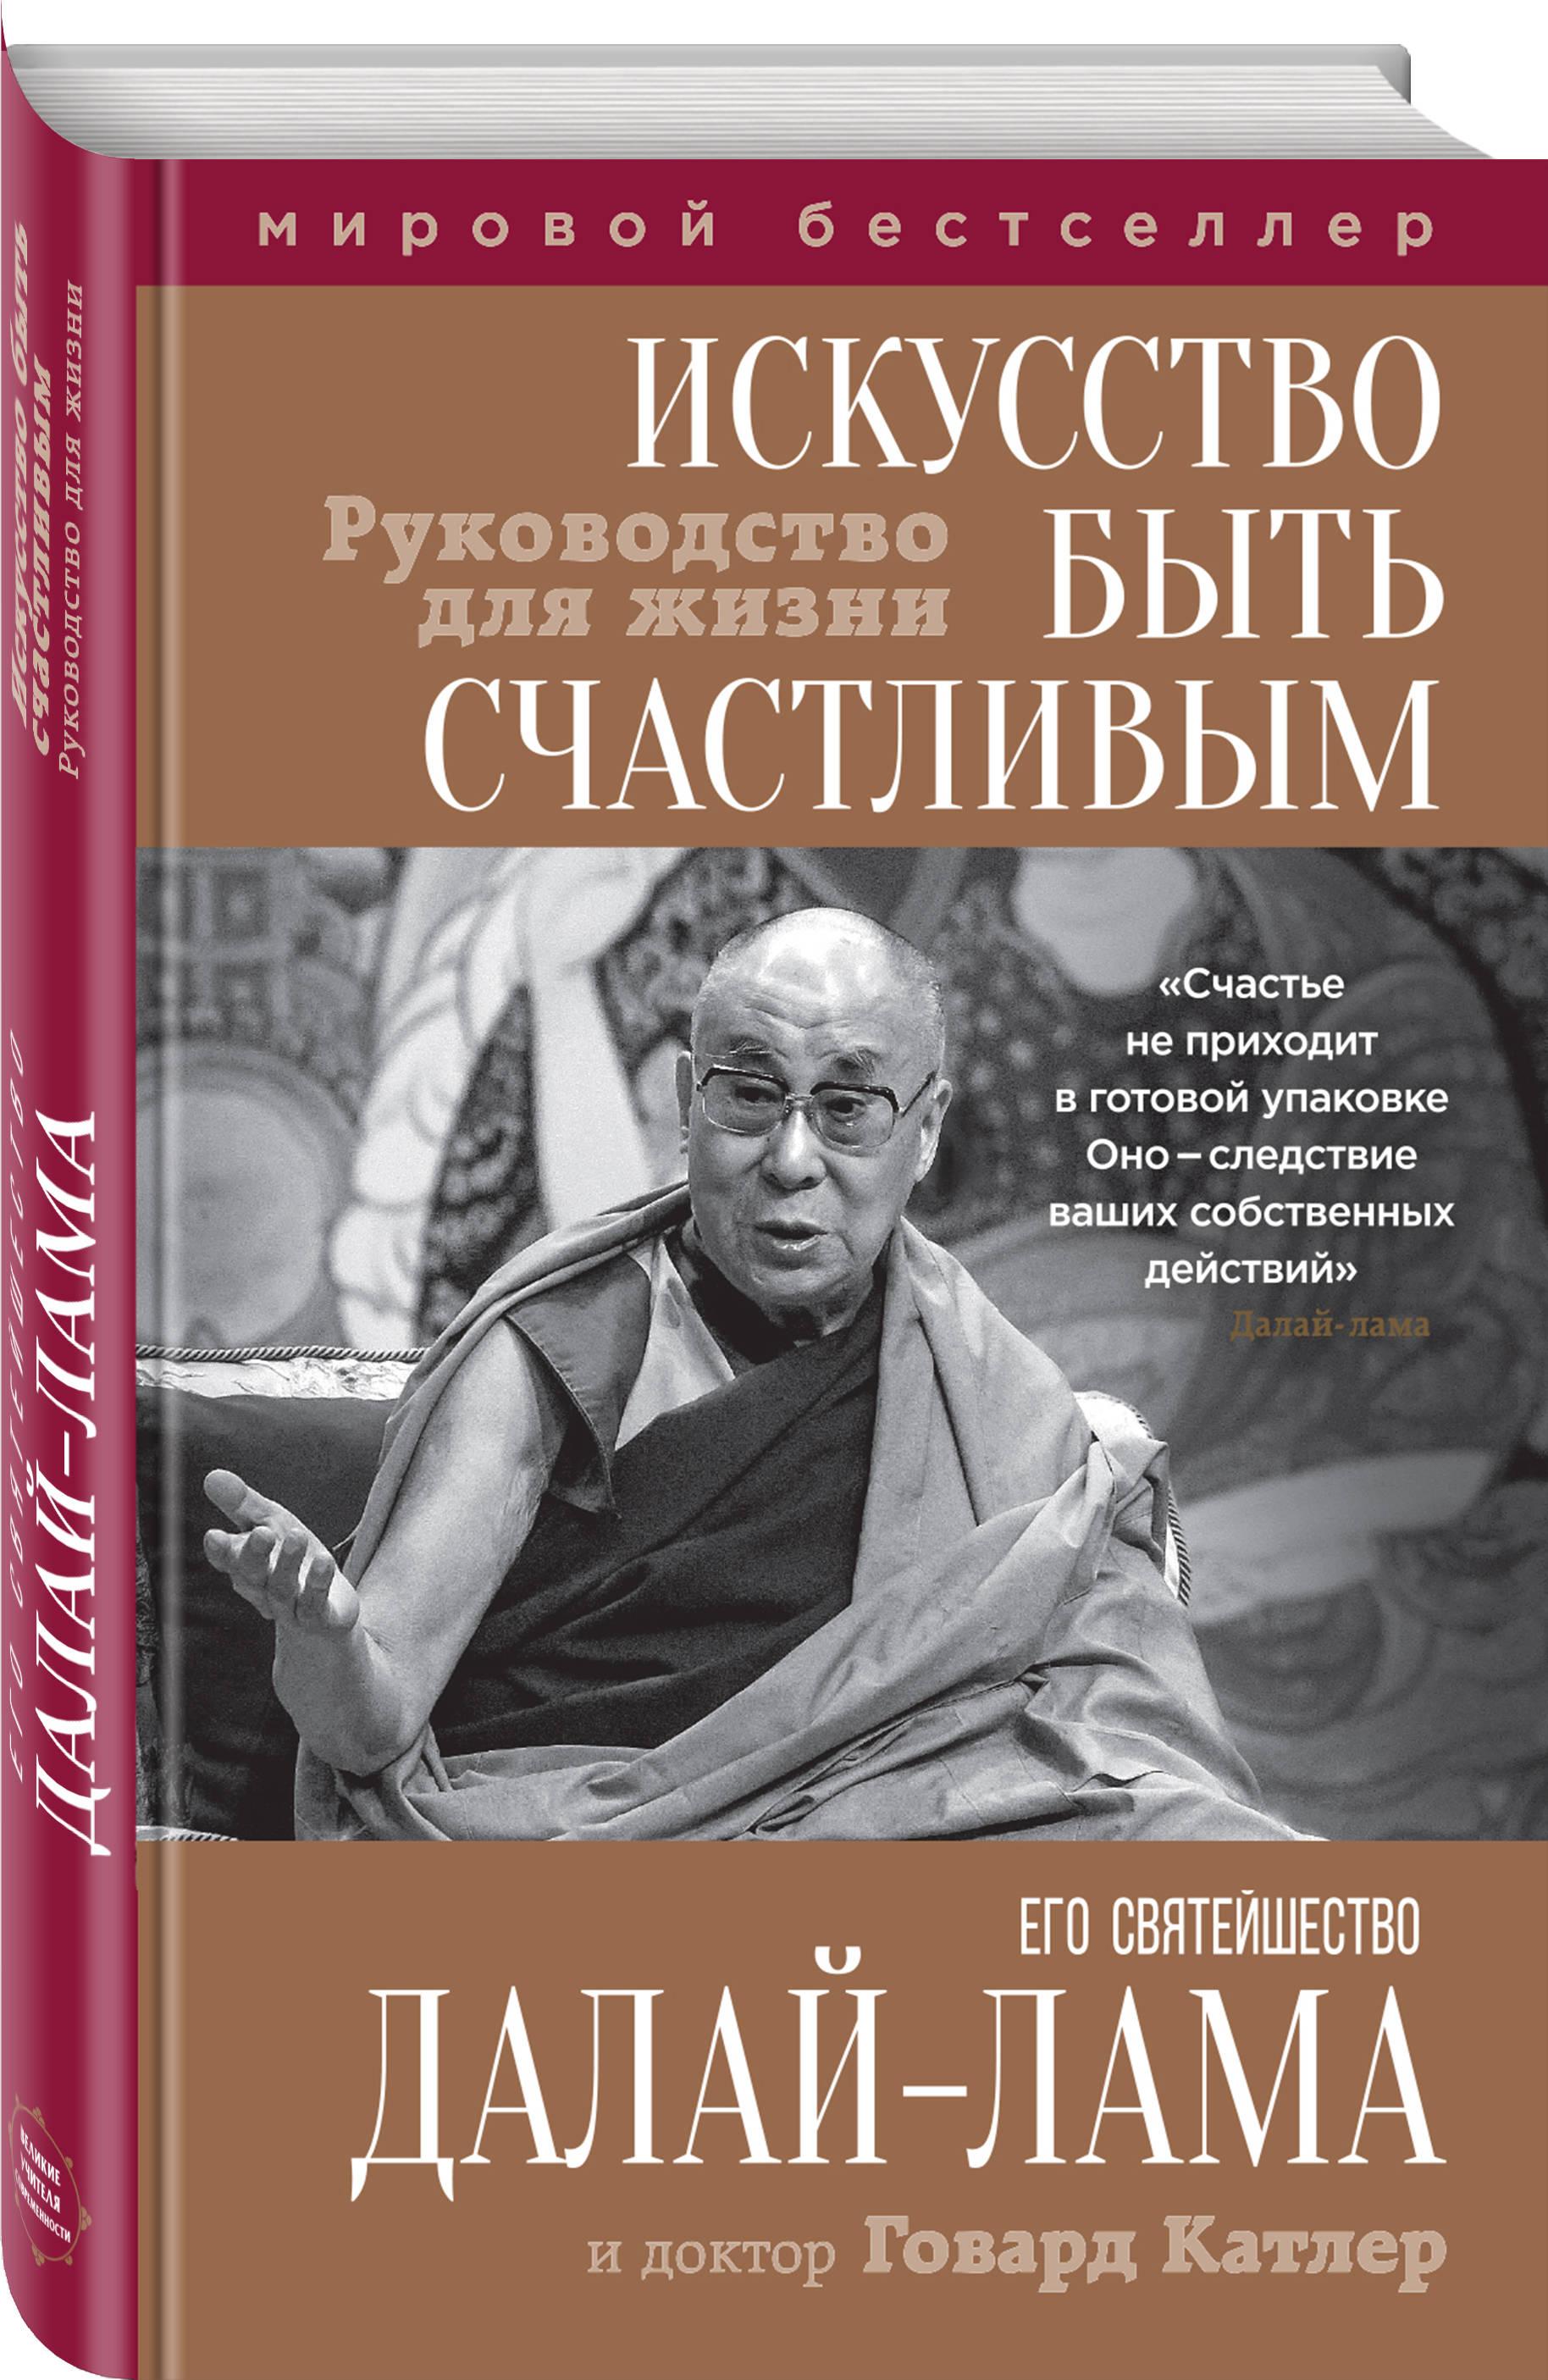 Далай-лама Искусство быть счастливым (оф. 7БЦ)